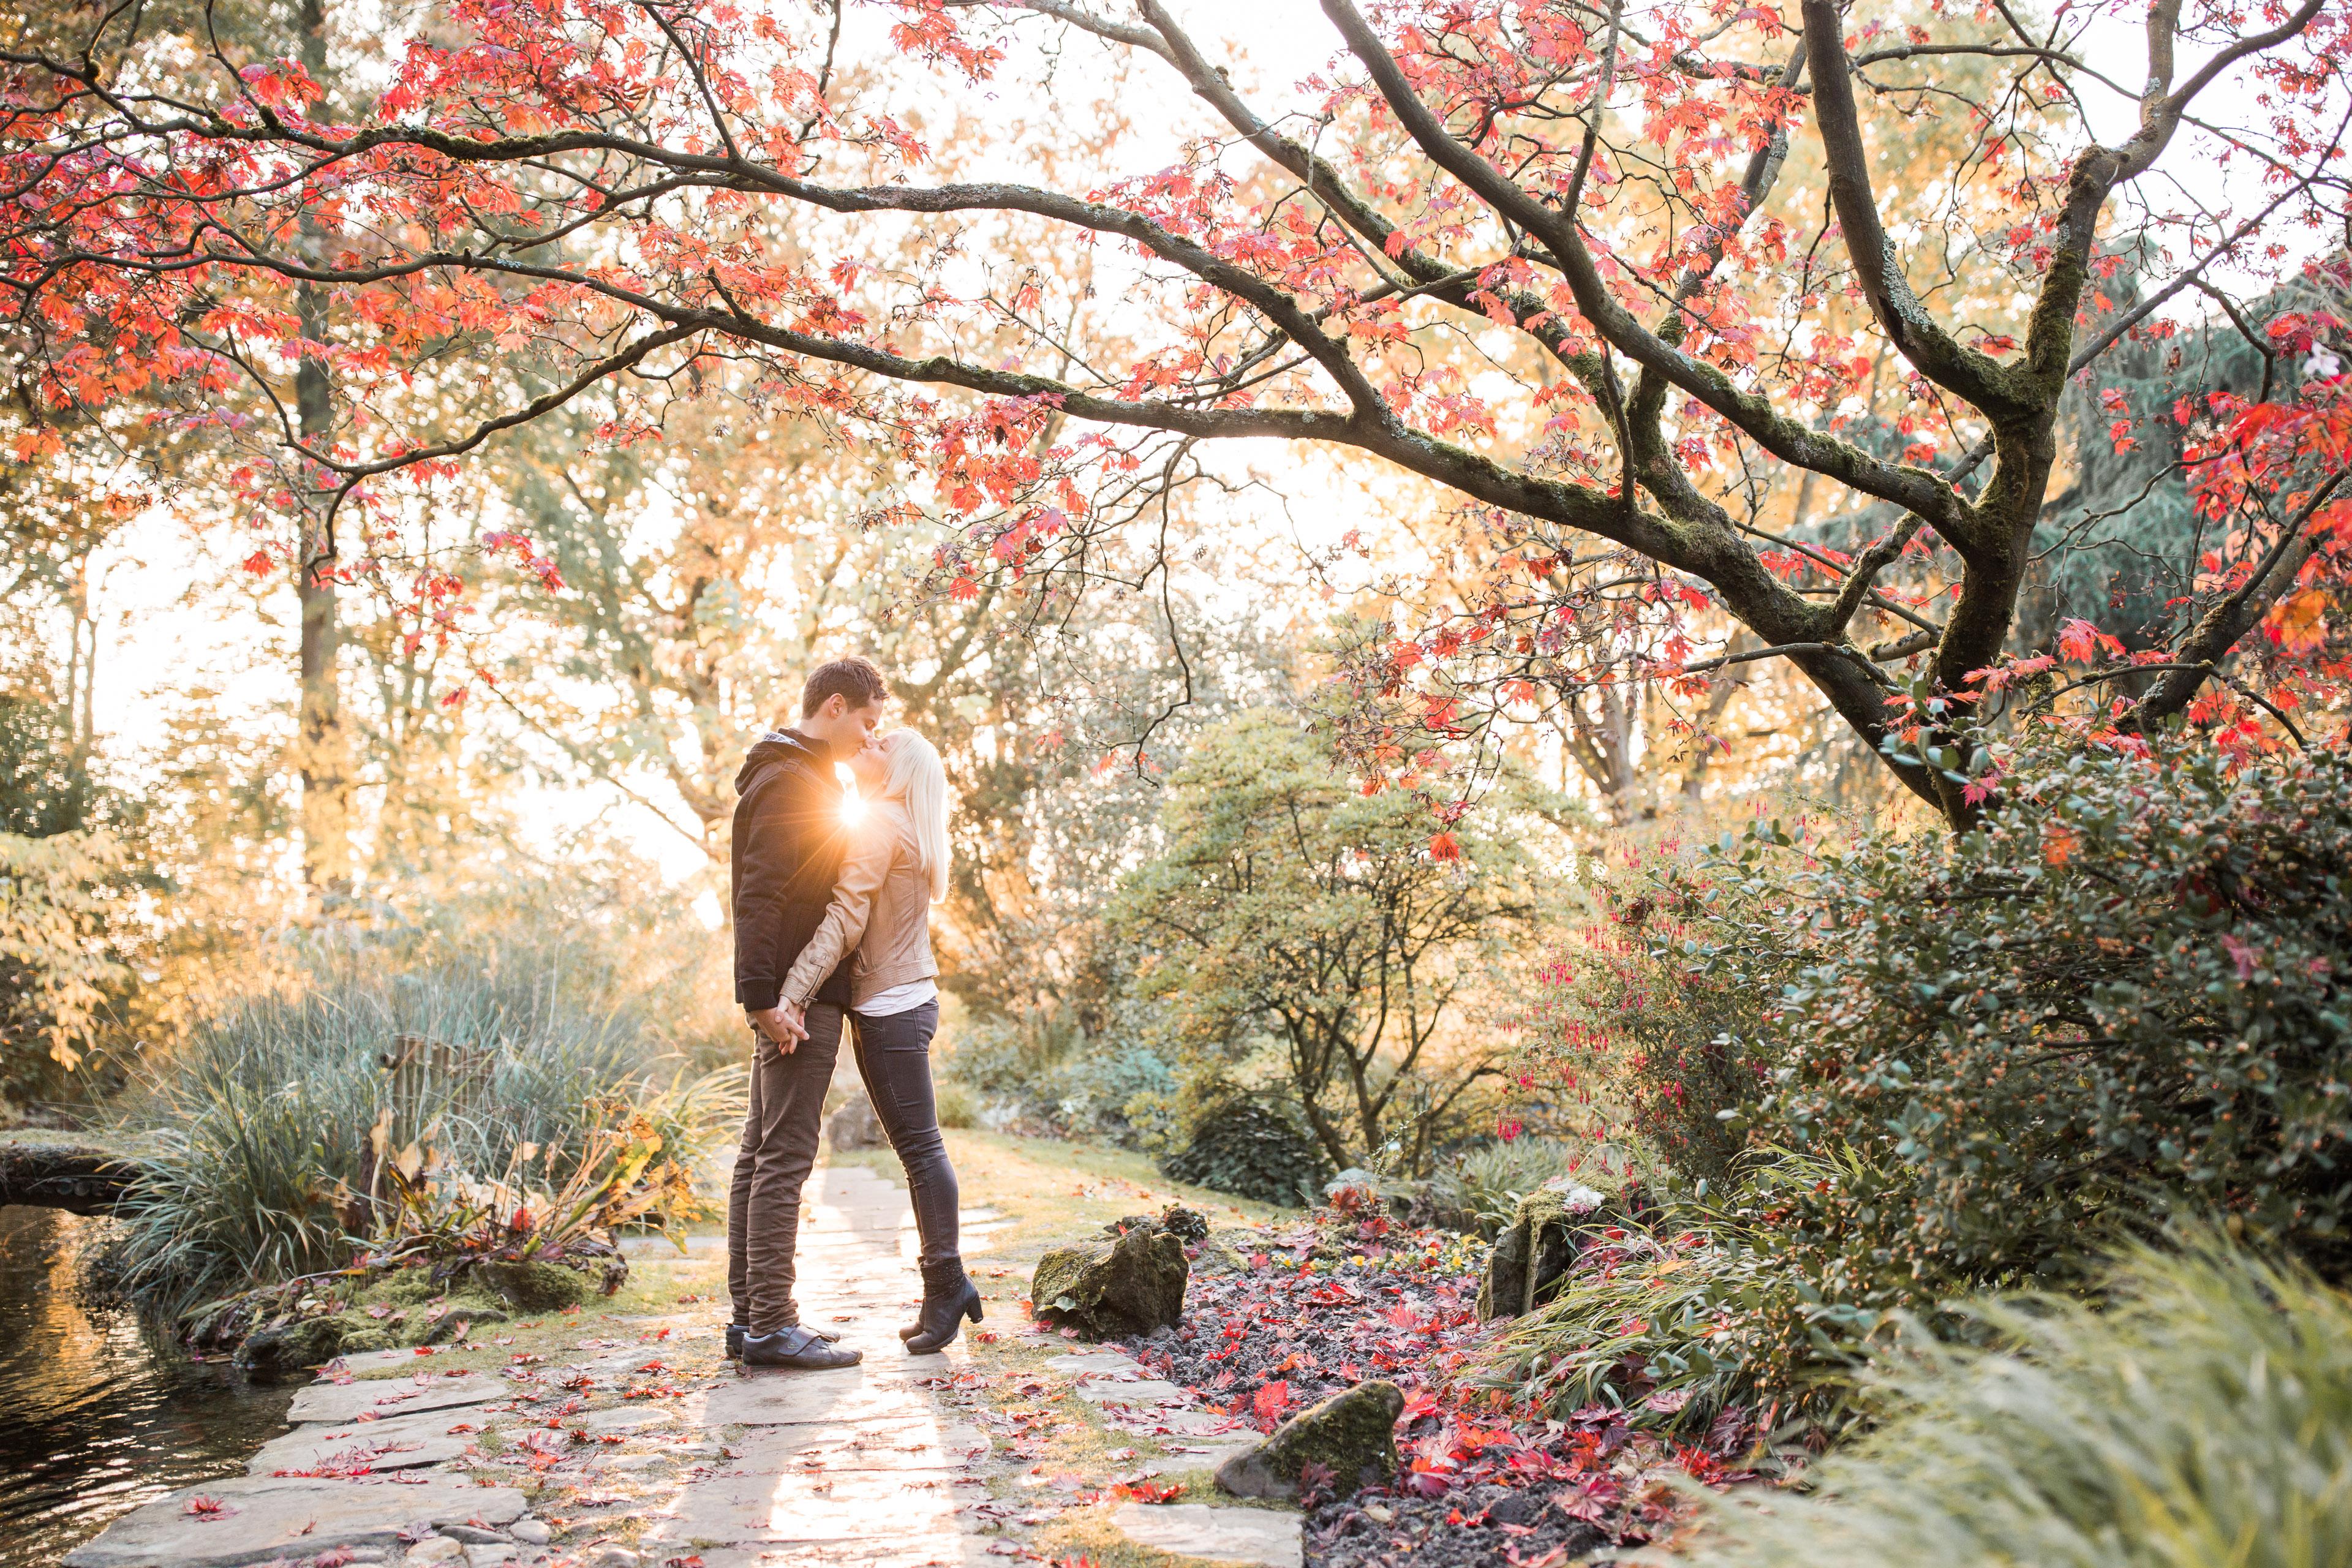 mcp ap019 fotografin verlobung engagement fotos koeln leverkusen